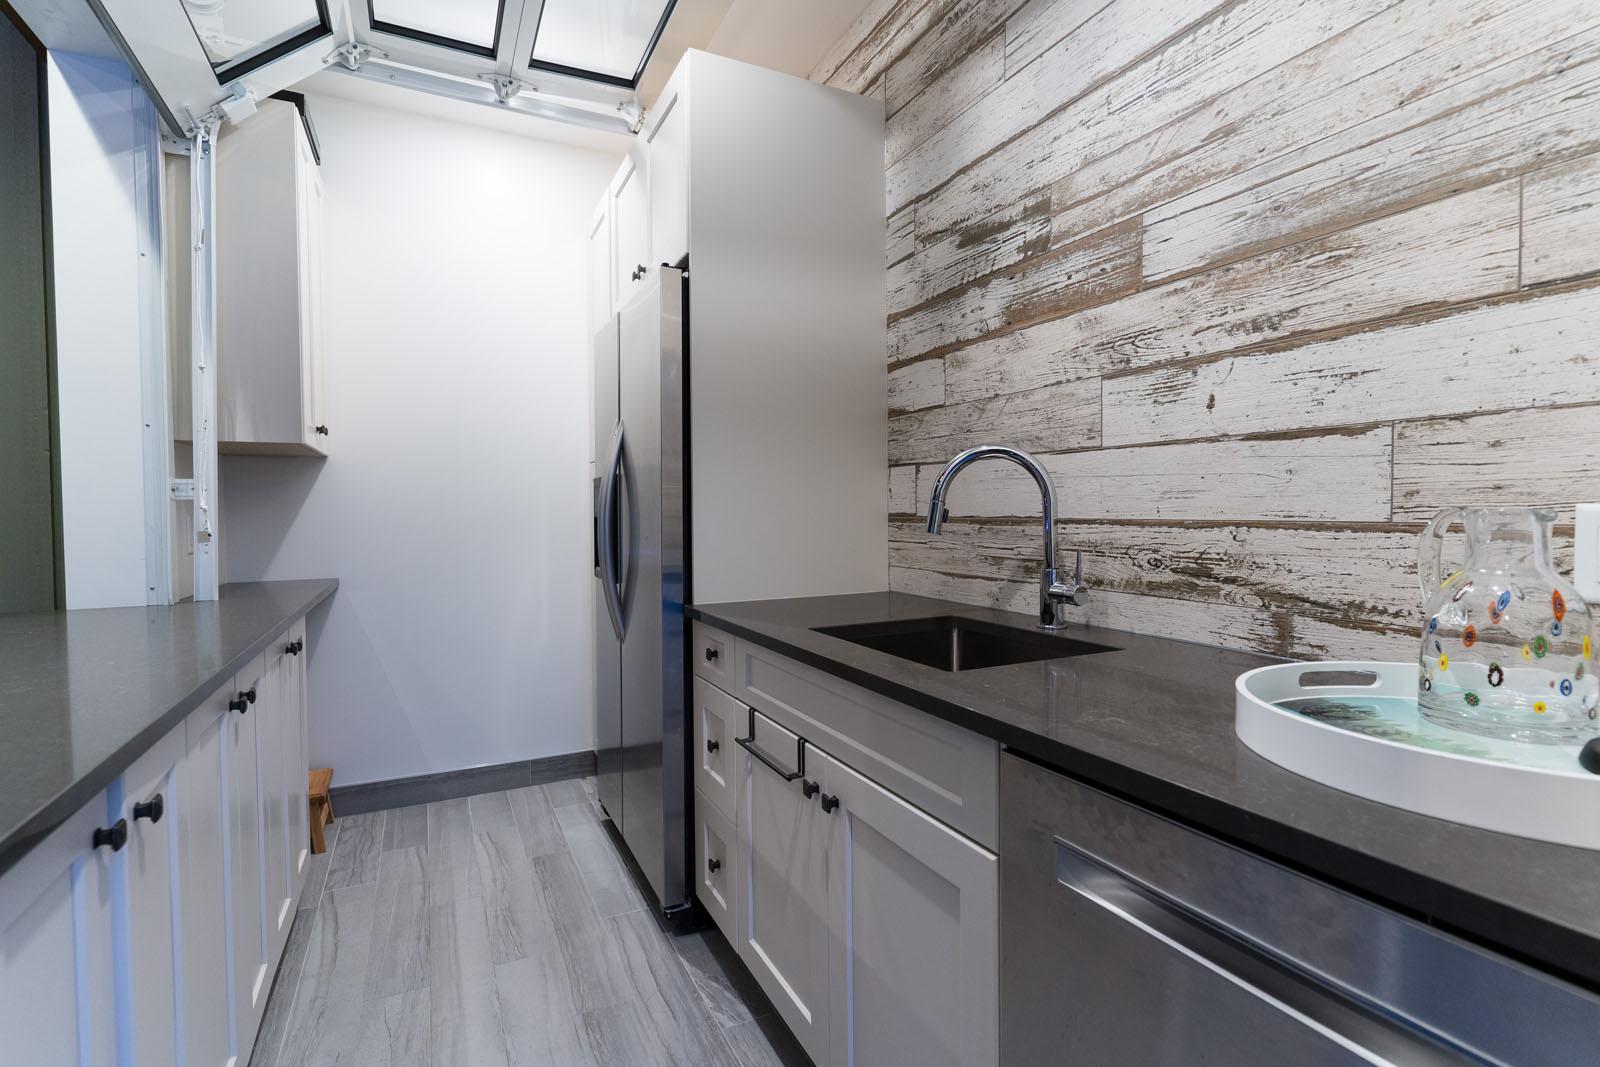 backyard-kitchen-azuro-LEH031